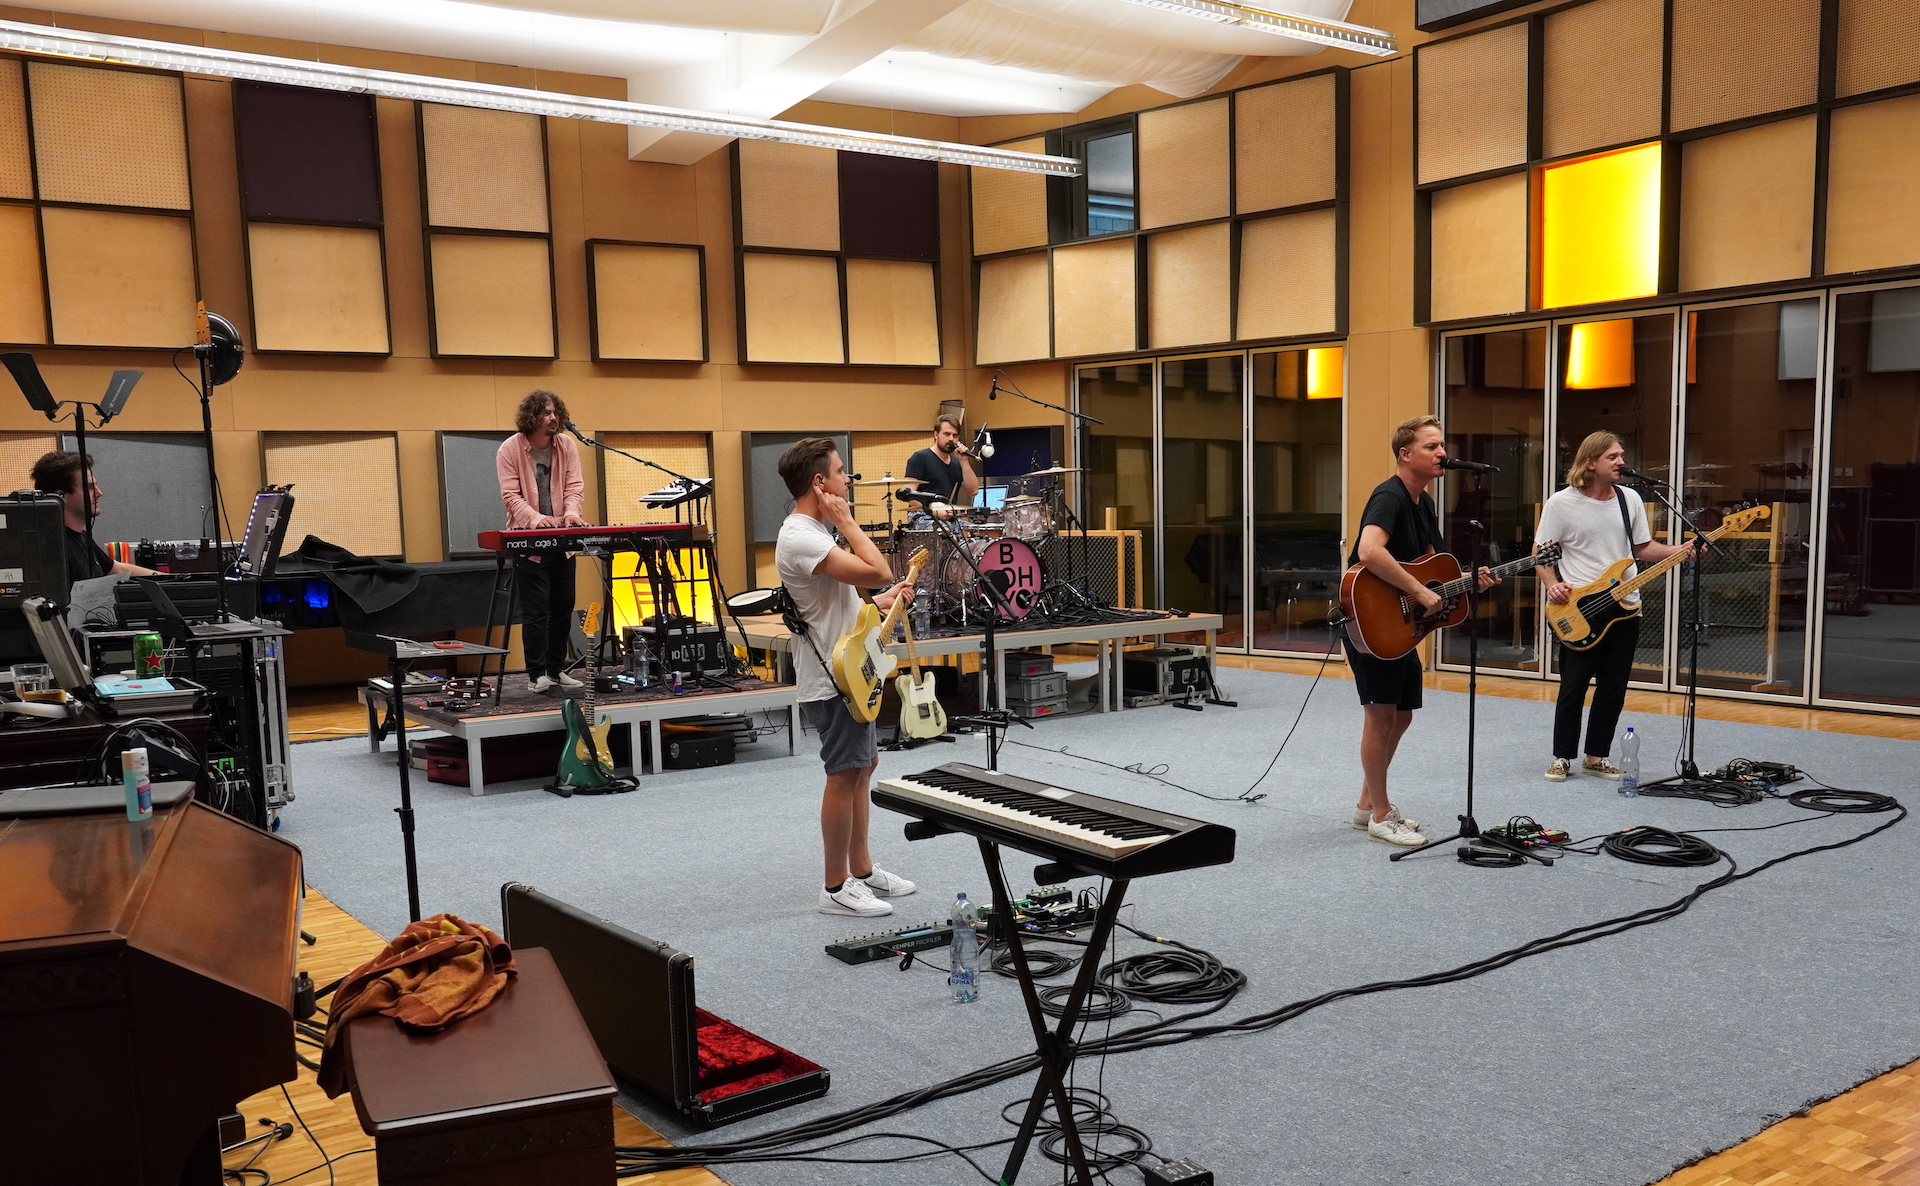 Band Hecht Probeweekend im Tonstudio Gabriel Recording